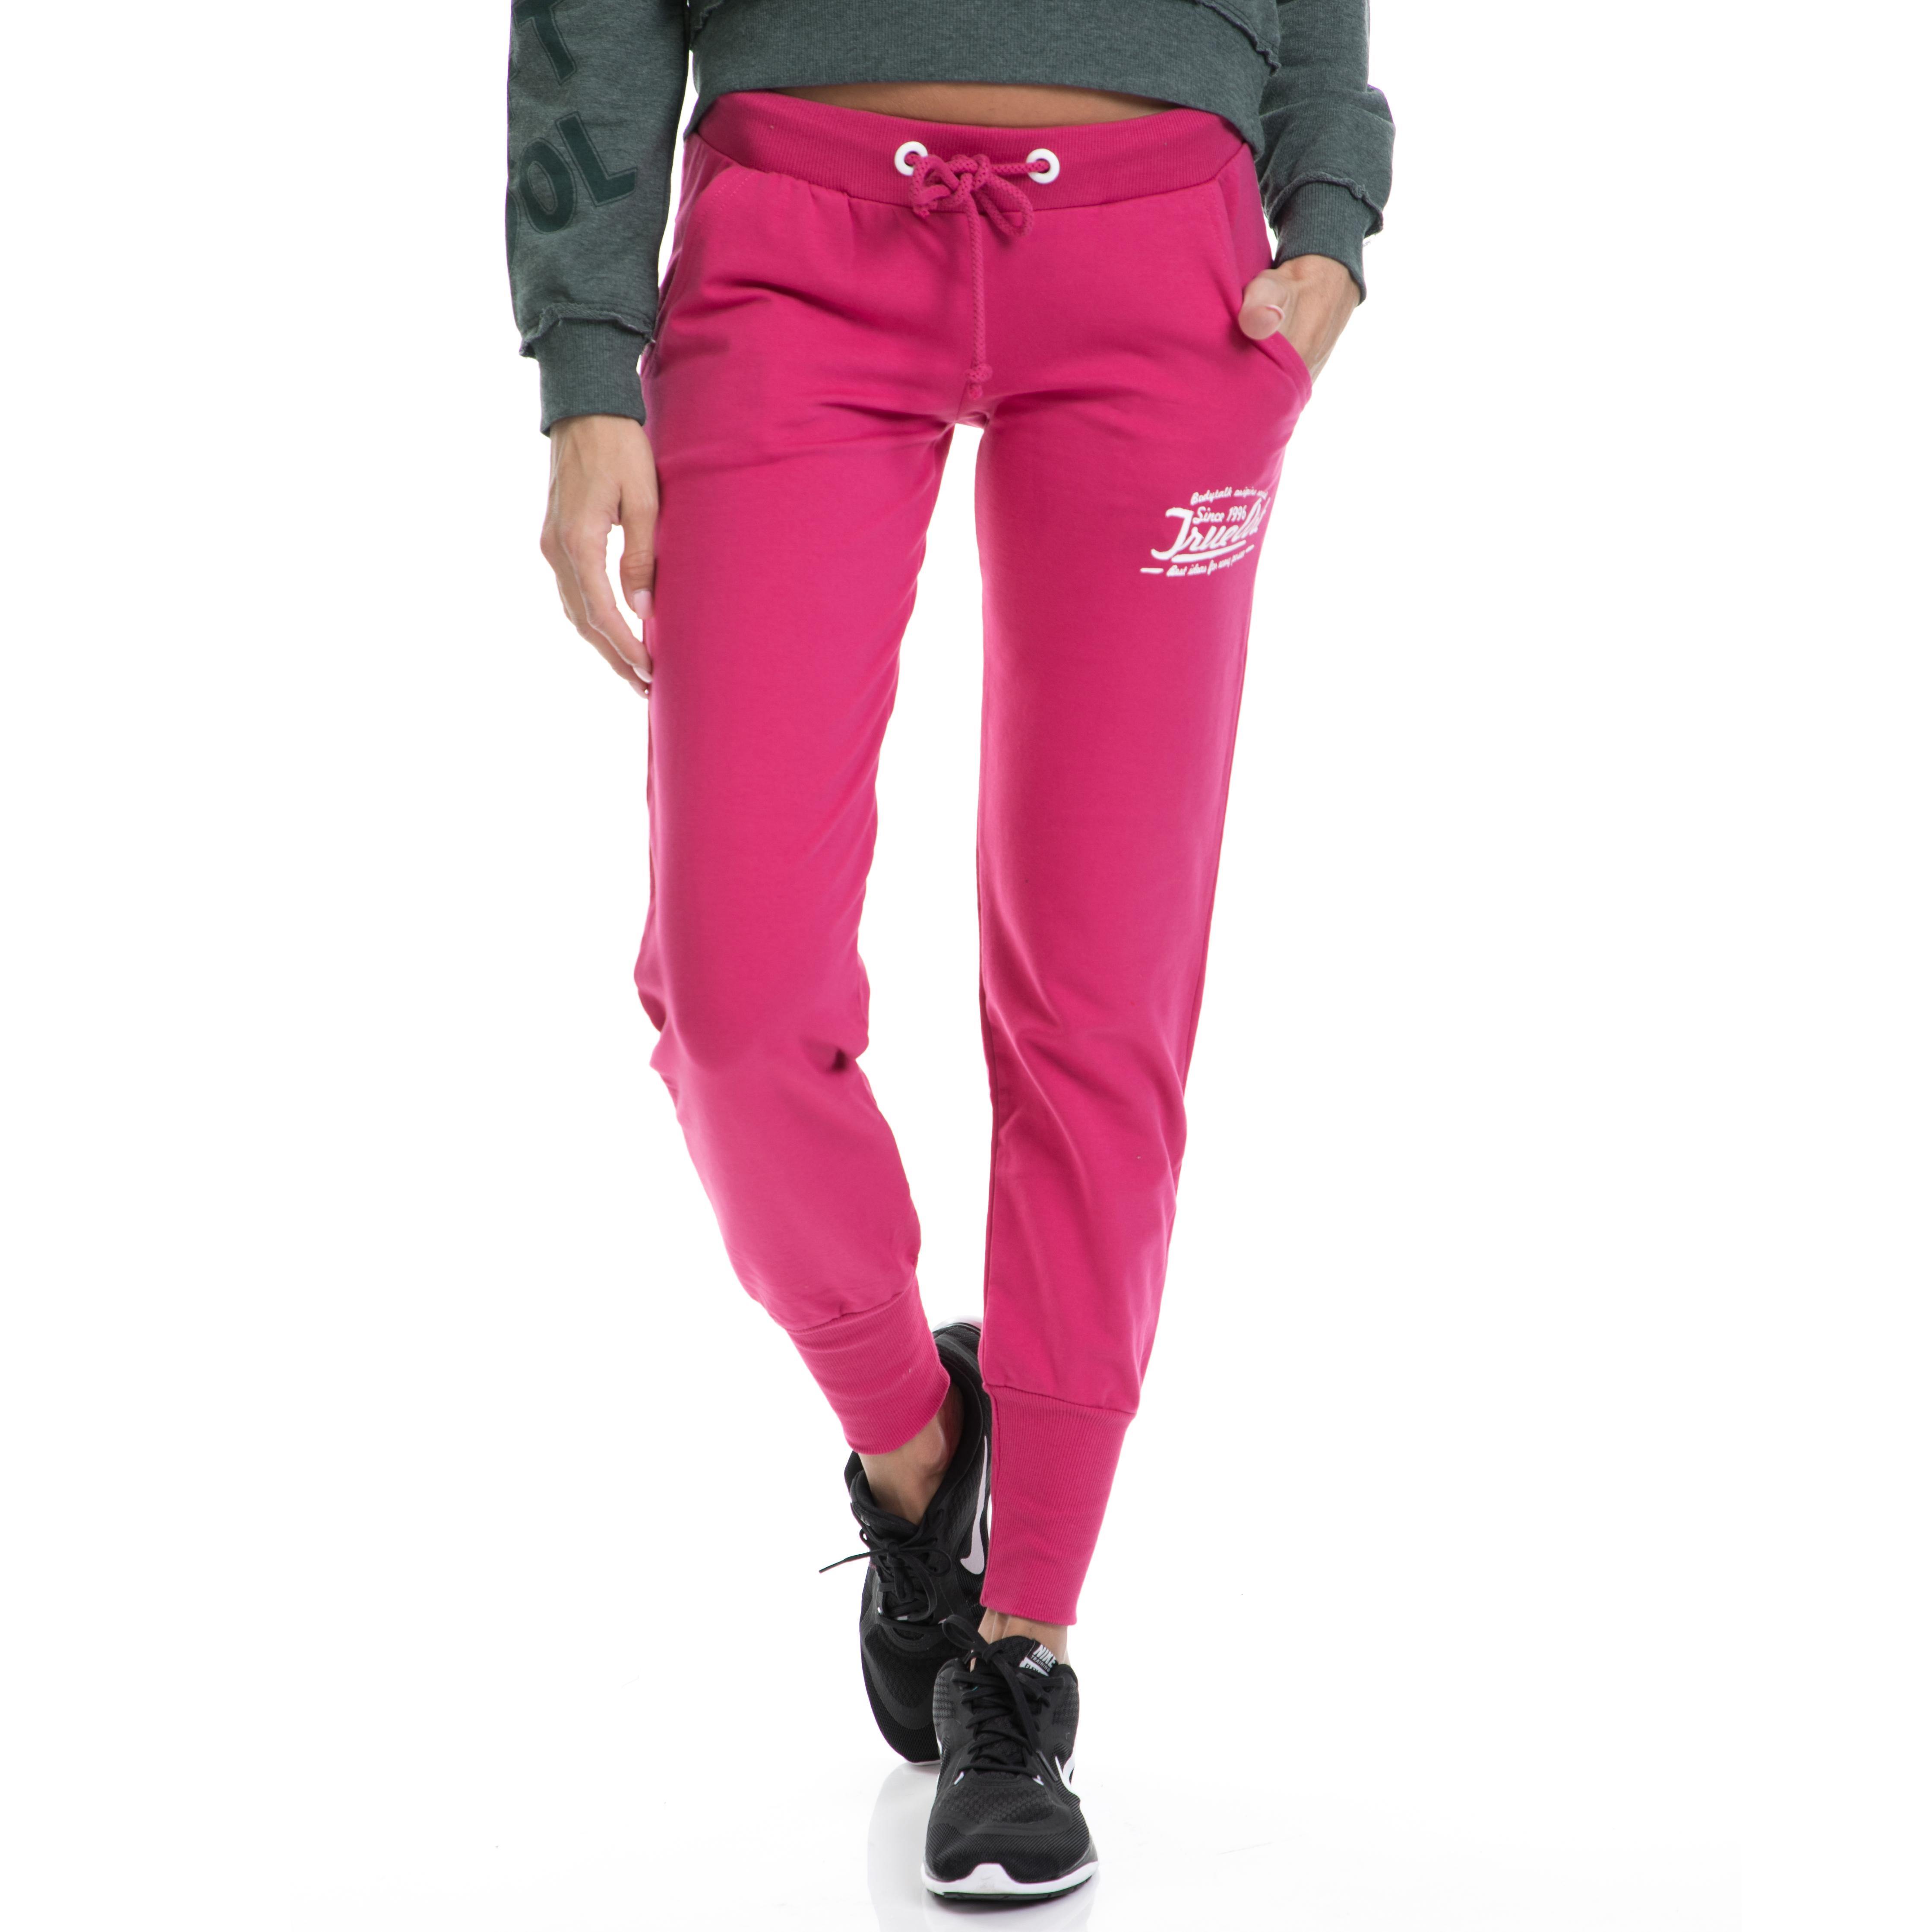 BODYTALK - Γυναικεία φόρμα BODYTALK ροζ γυναικεία ρούχα αθλητικά φόρμες